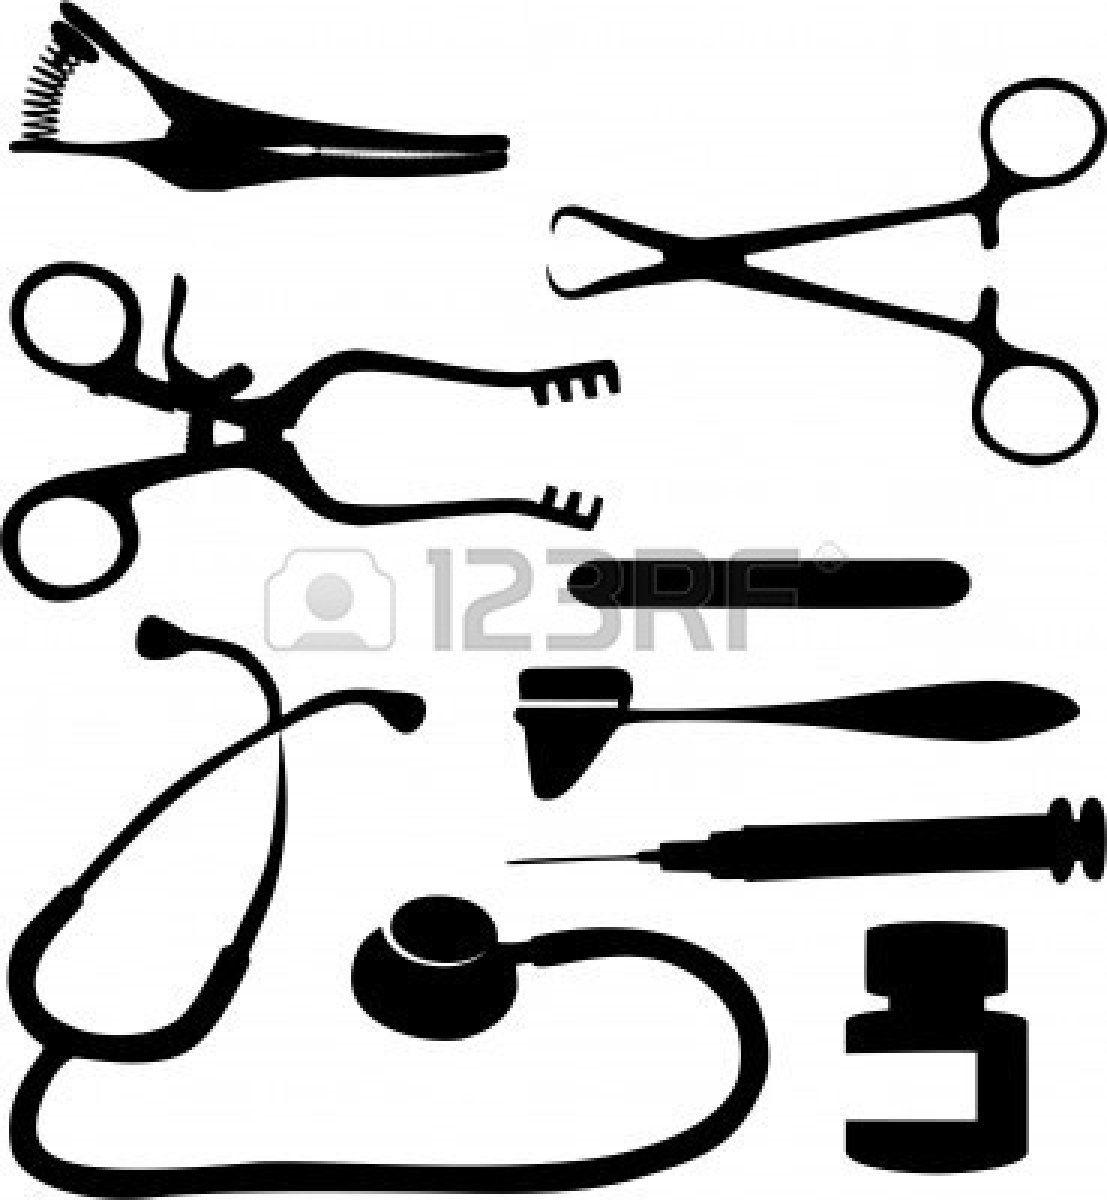 Clip Art Doctor Medical Symbols